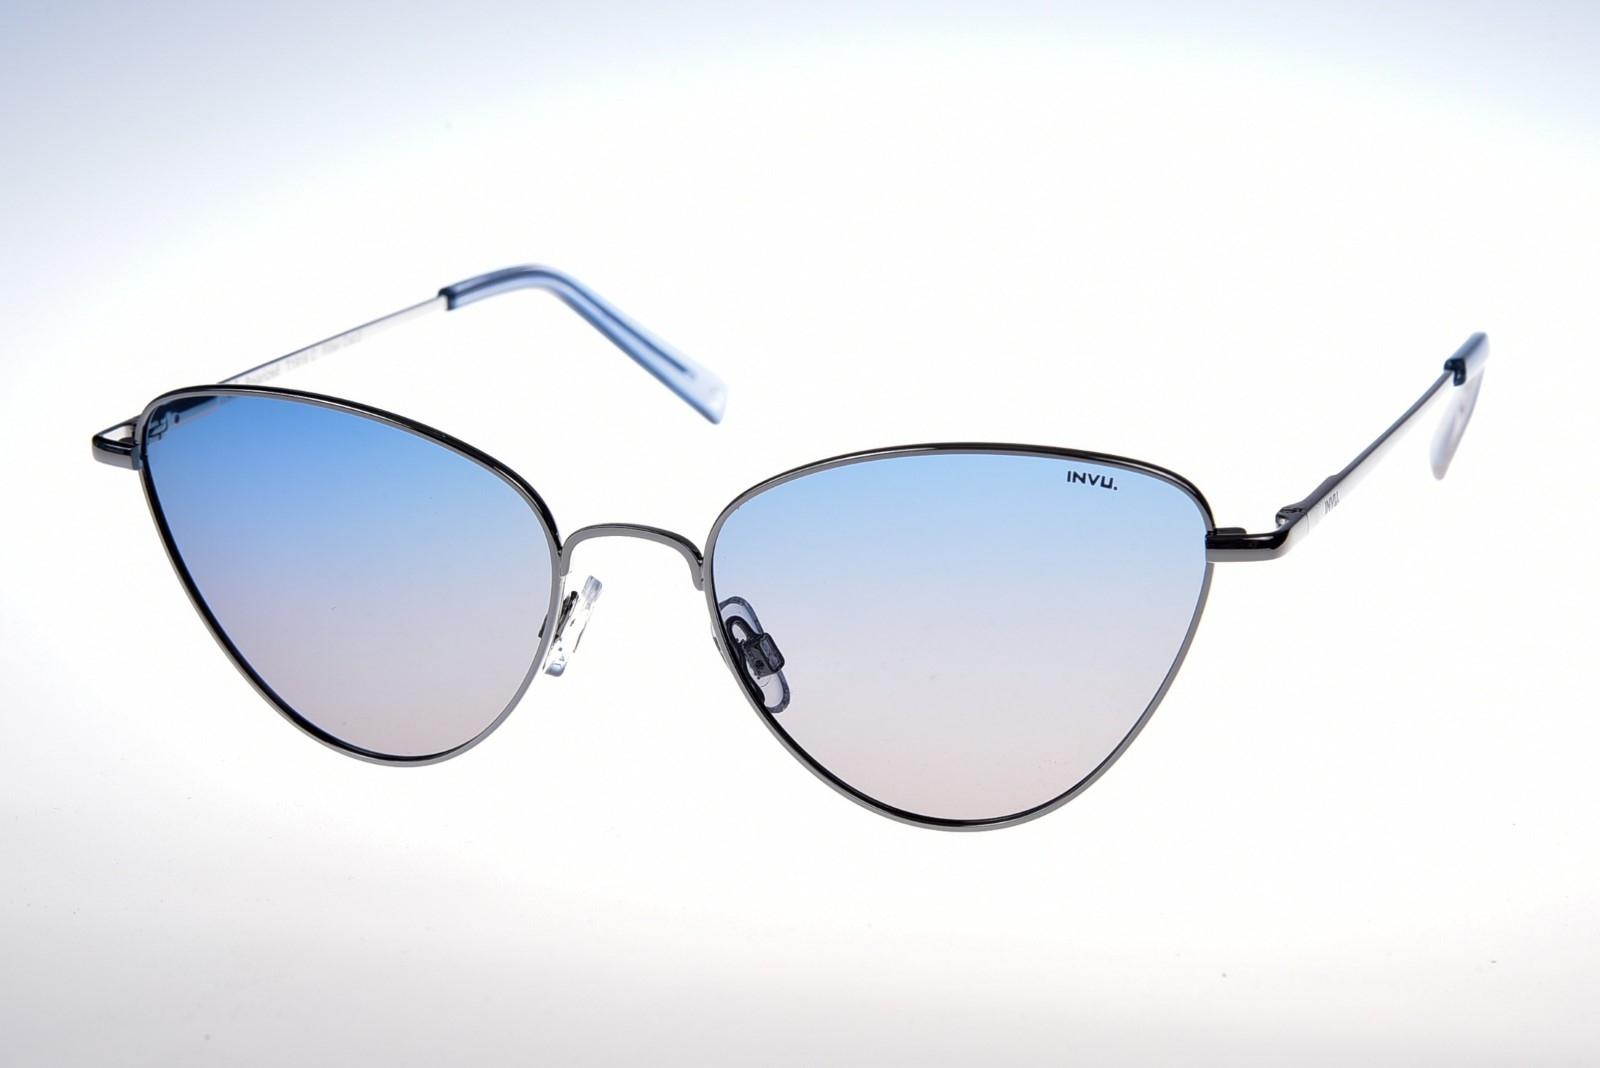 INVU. Trend T1916C - Dámske slnečné okuliare